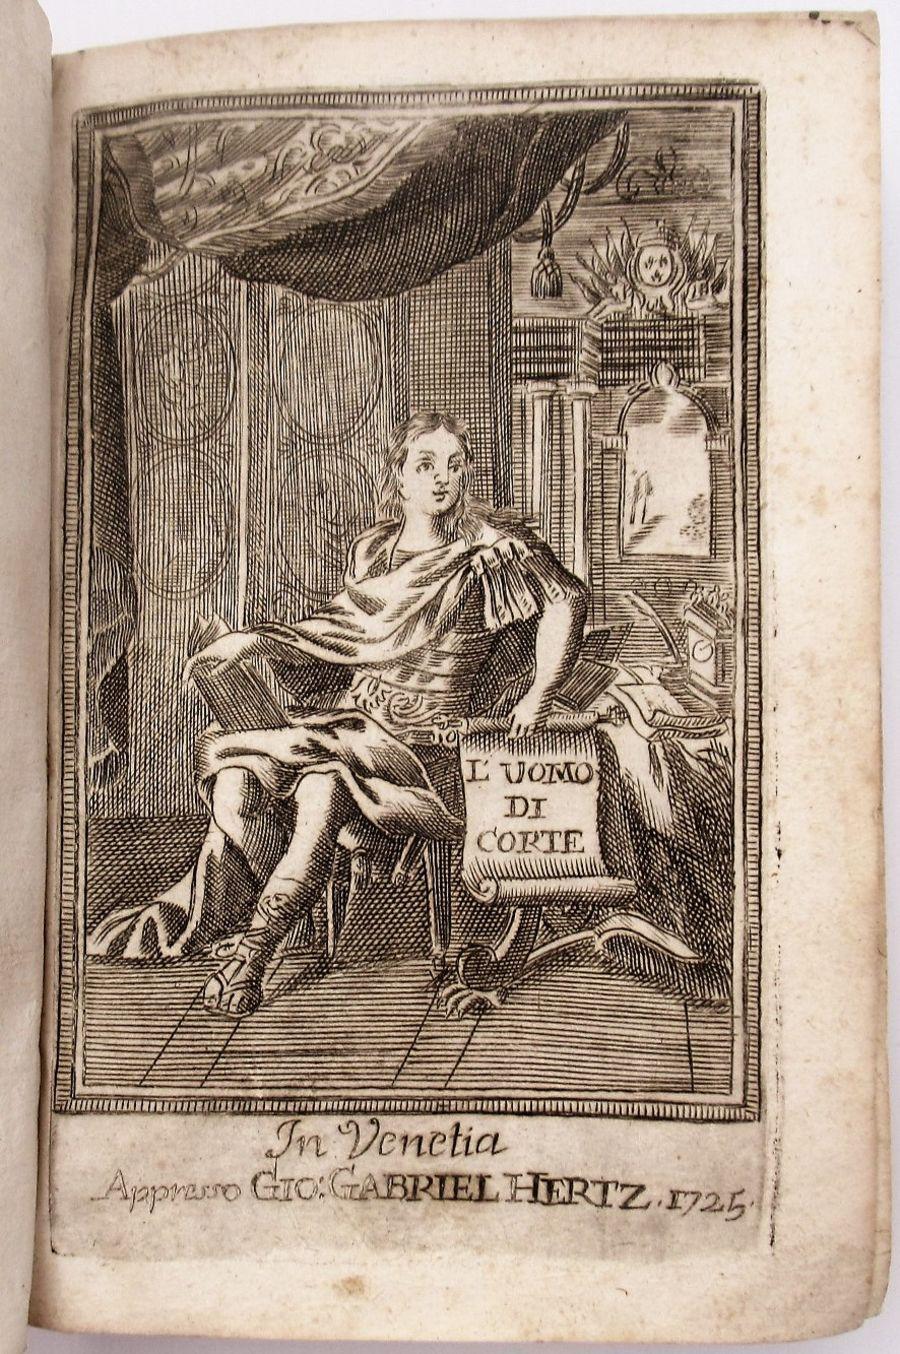 L'Uomo di Corte, Baldassar Graziano, Jesuit philosophical work publ Venice 1731